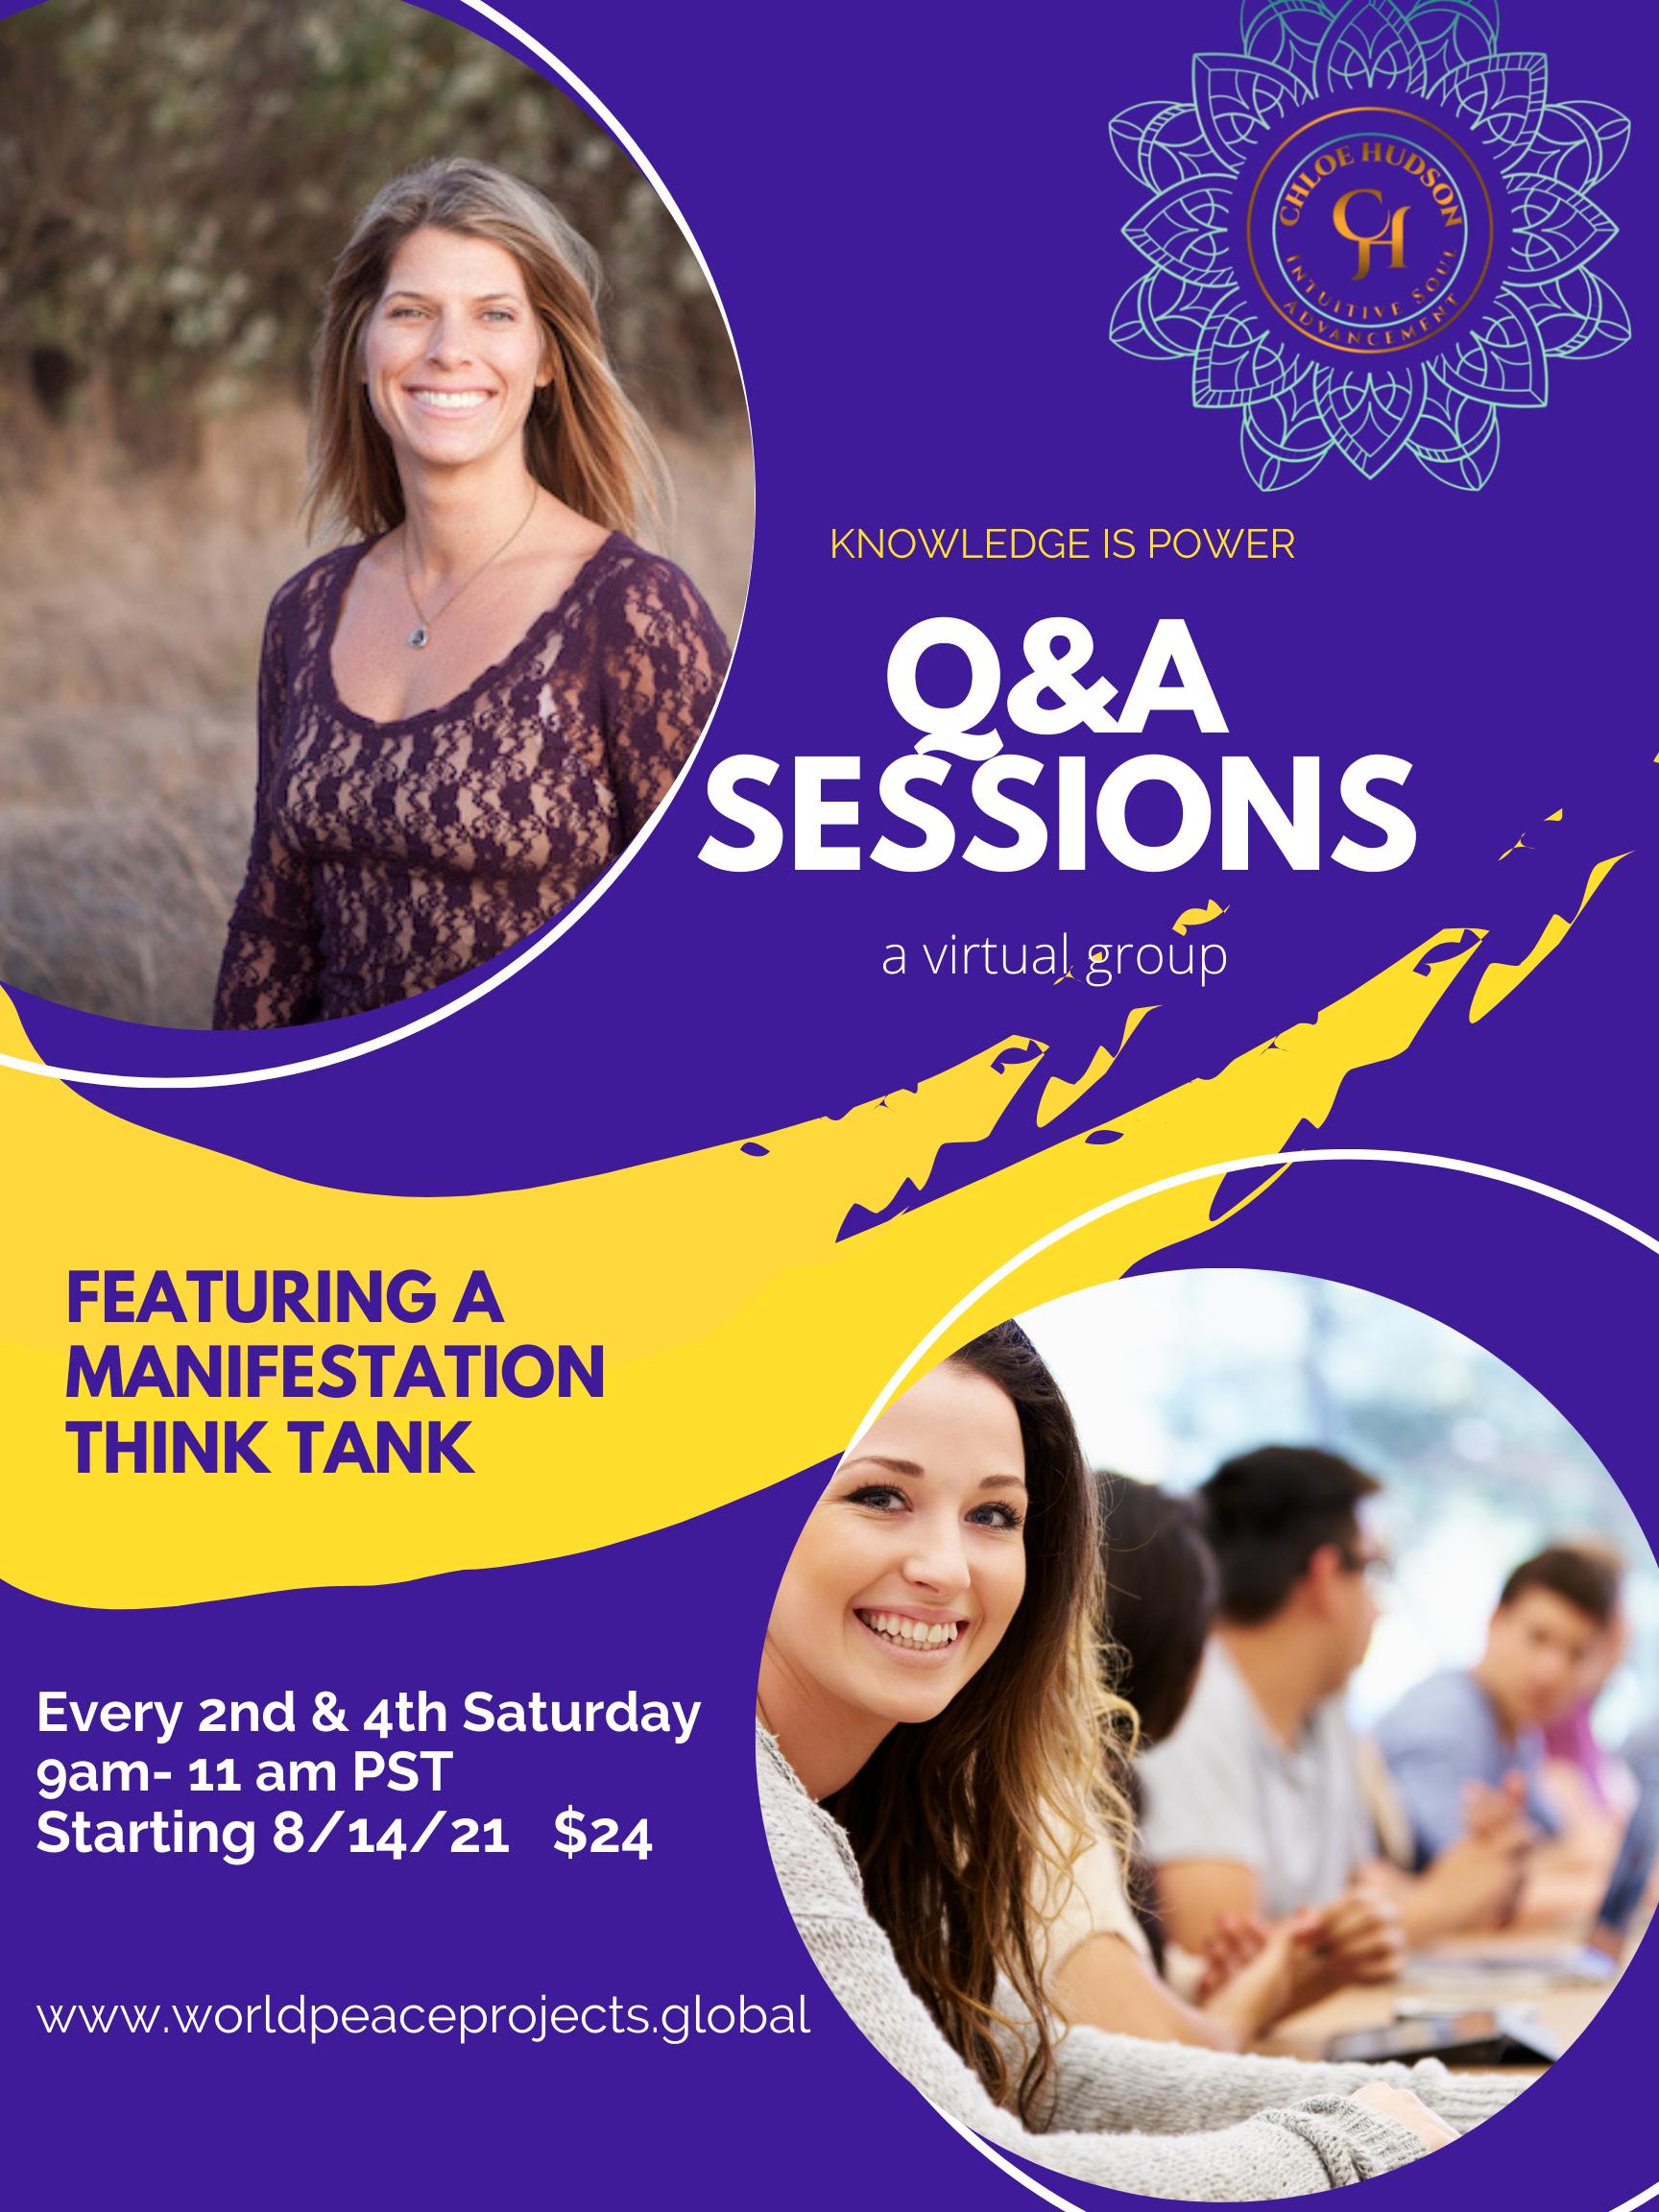 Q&A Sessions + Manifestation Think Tank